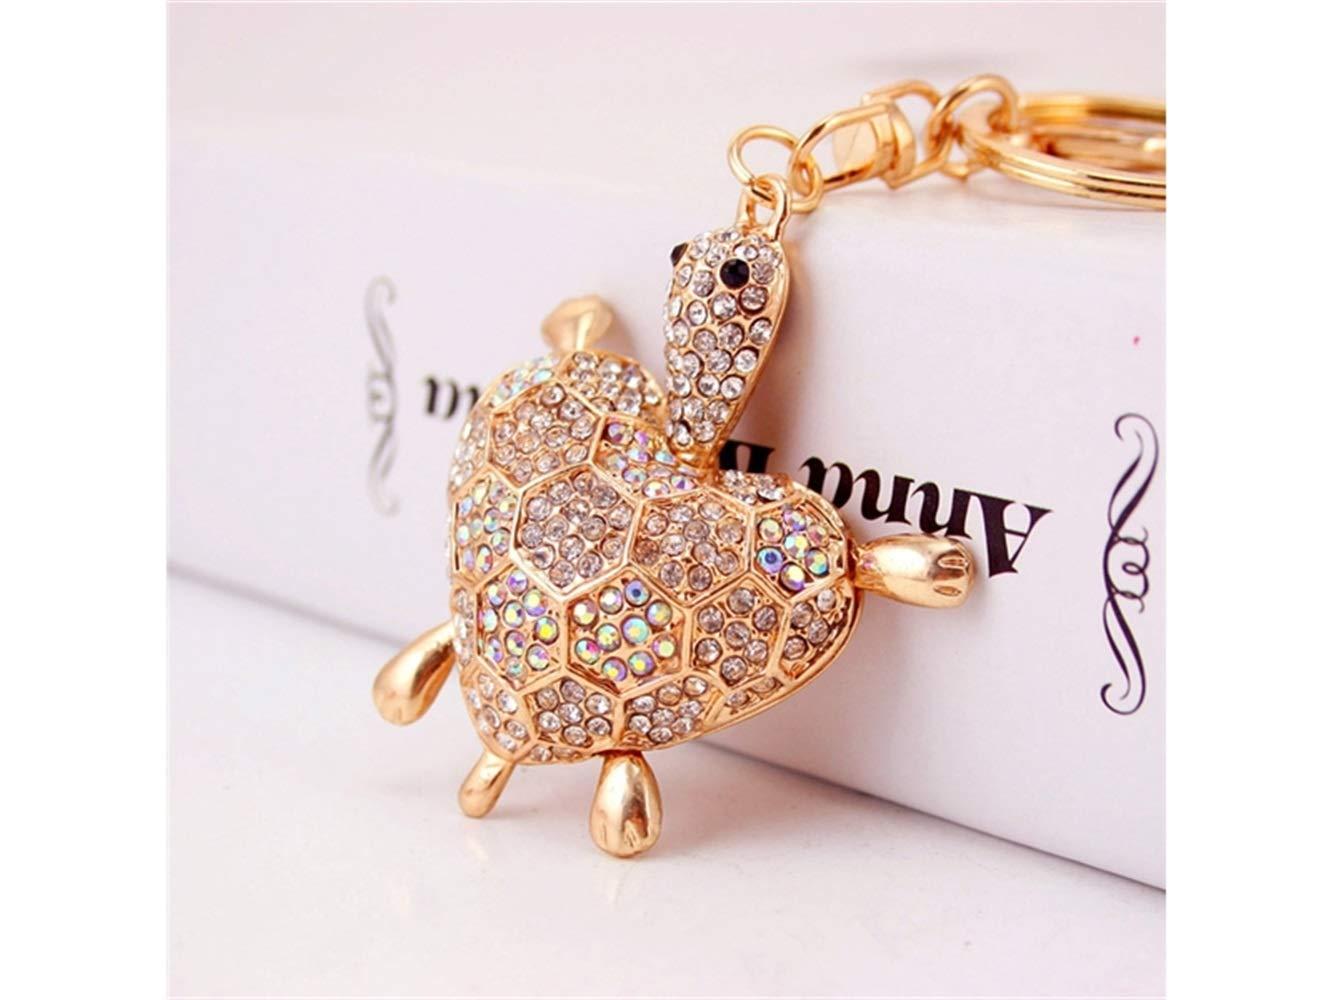 Car Keychain, Cute Diamond Love Back Shell Turtle Keychain Animal Key Trinket Car Bag Key Holder Decorations(White) for Gift